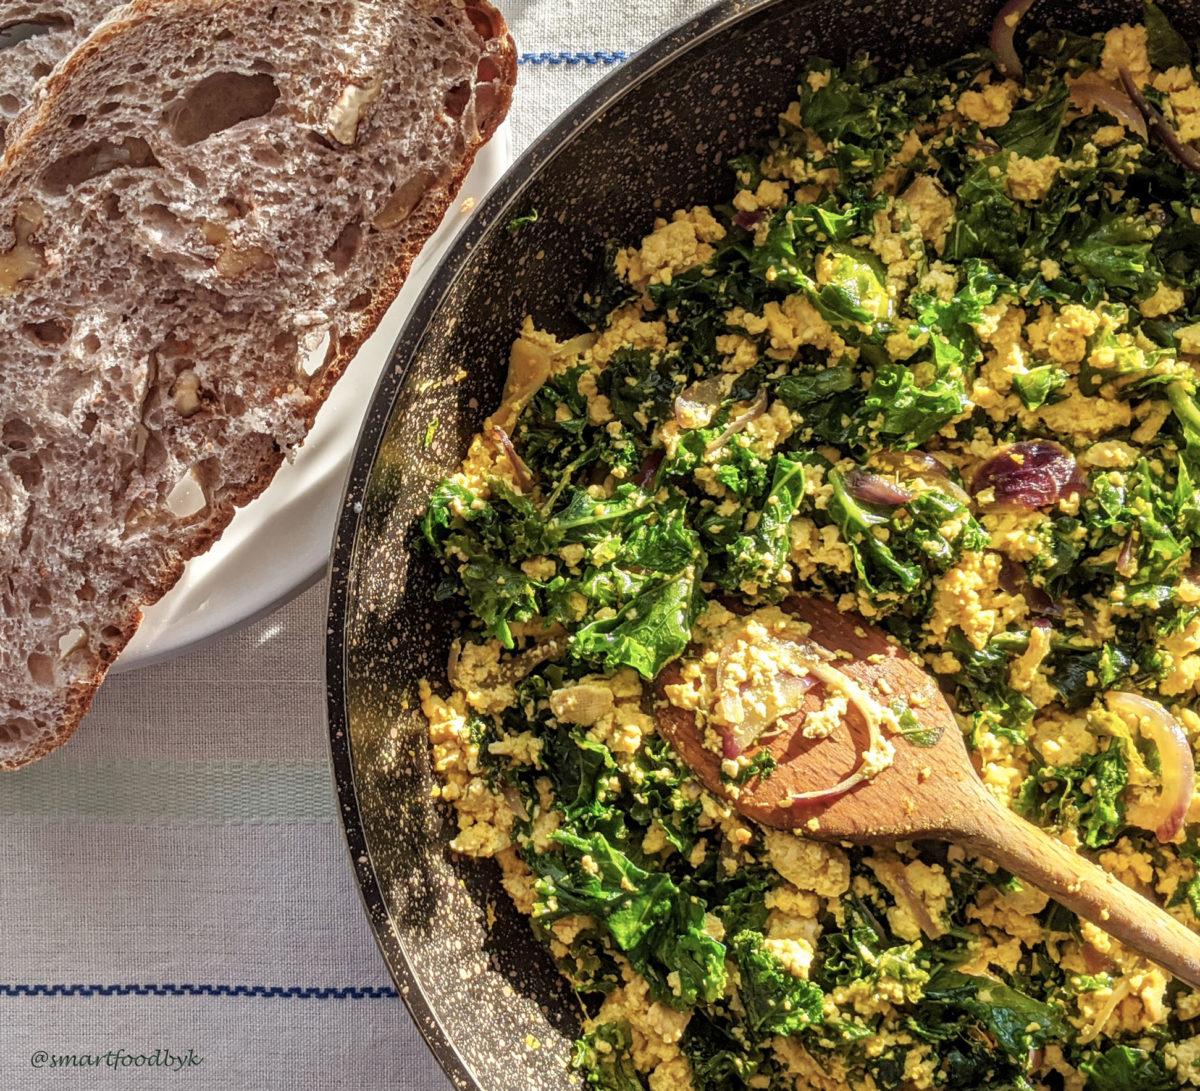 Toflette, my vegan tofu omelette